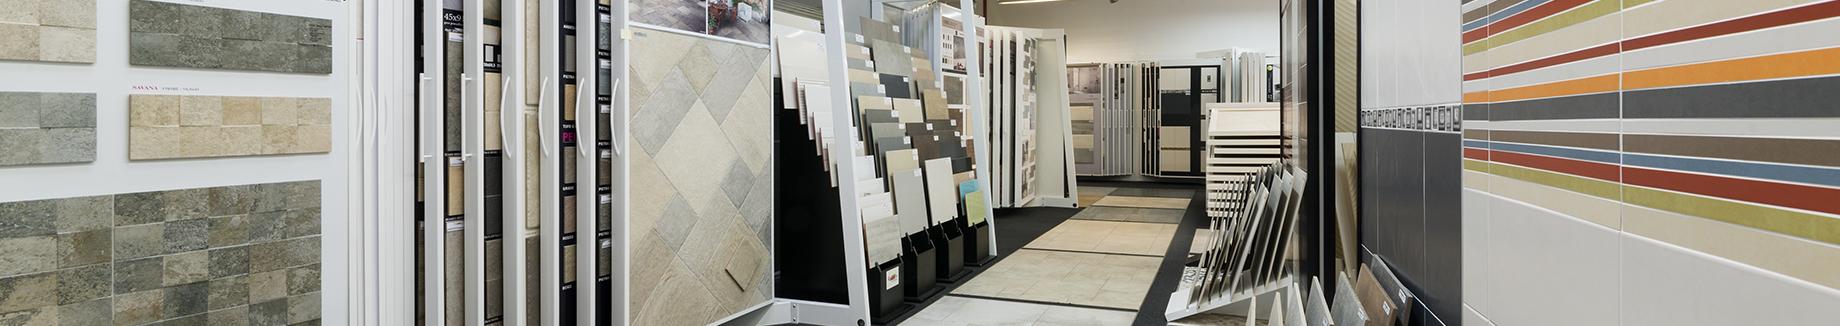 actualit s routhiau carrelage. Black Bedroom Furniture Sets. Home Design Ideas